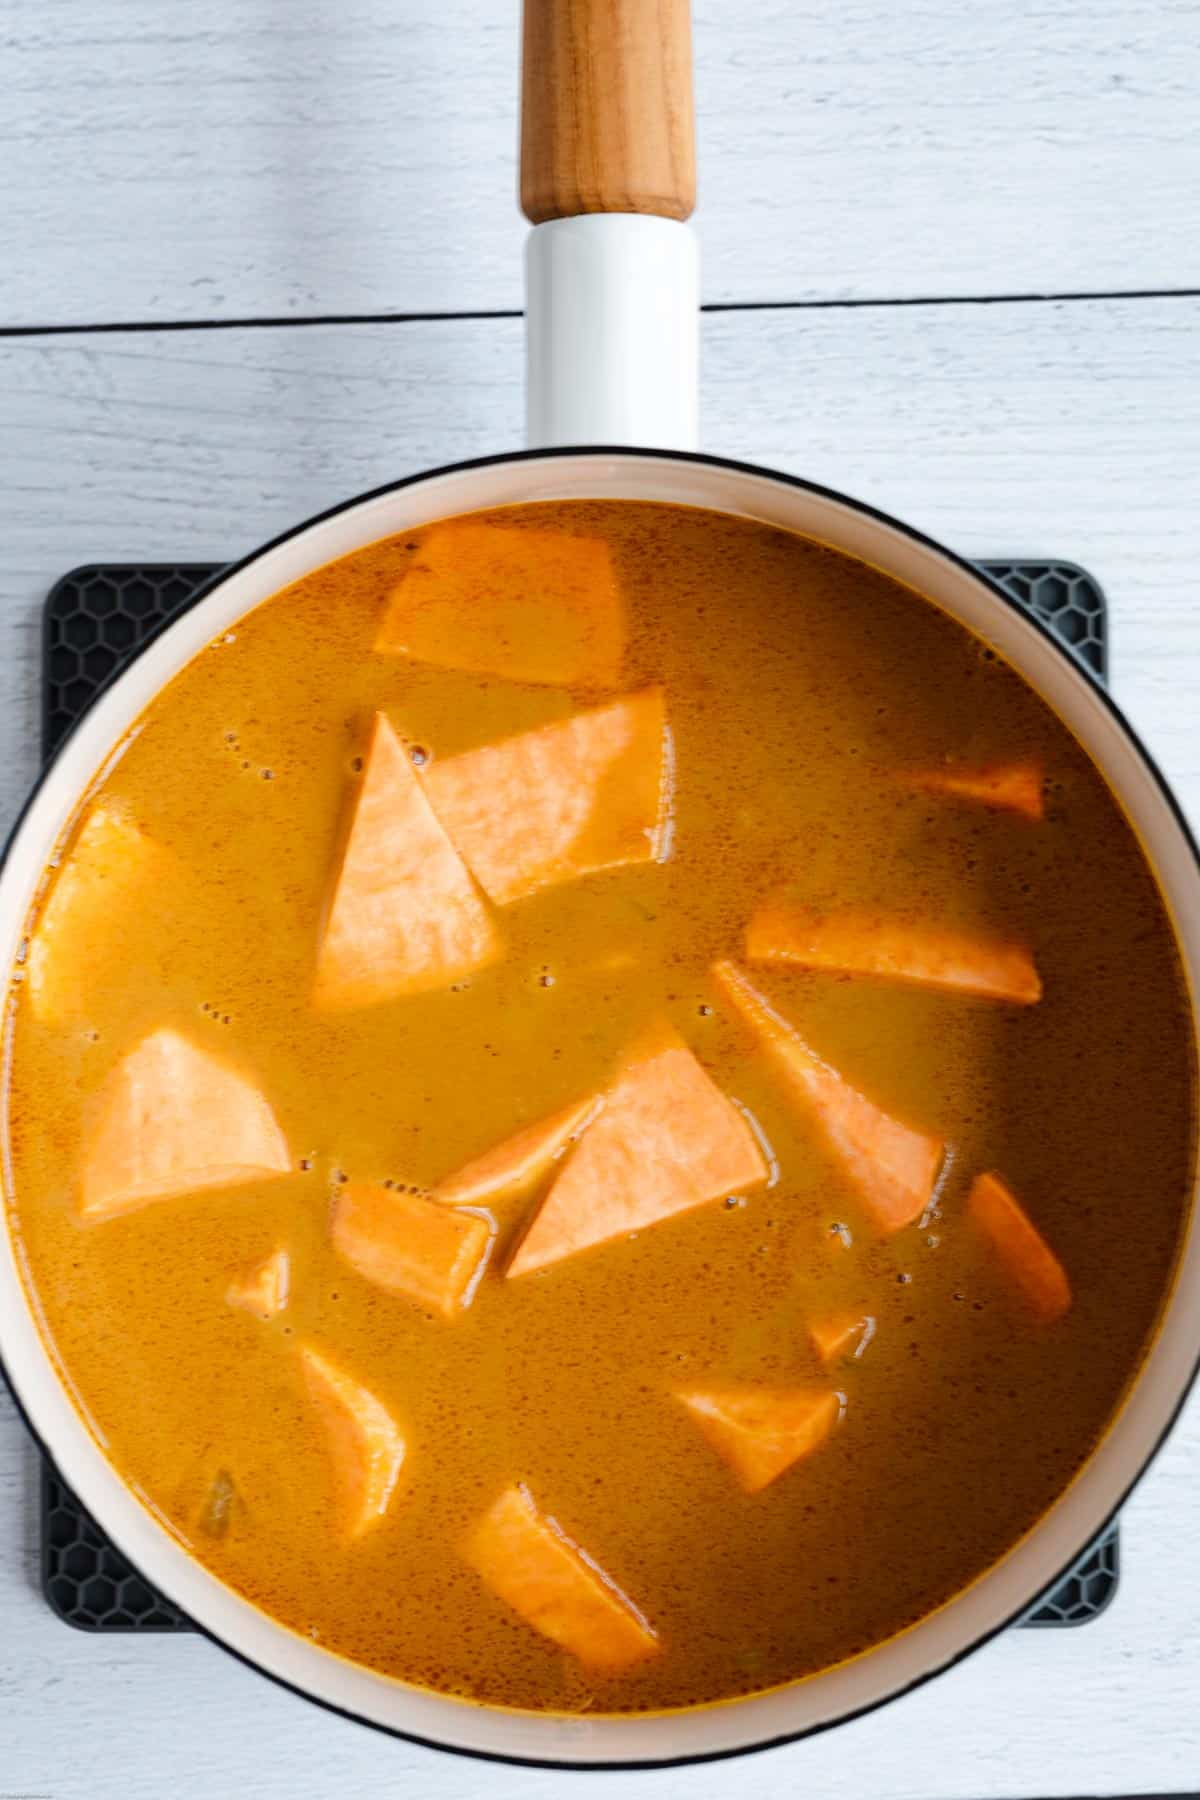 Adding sweet potato to the curry.